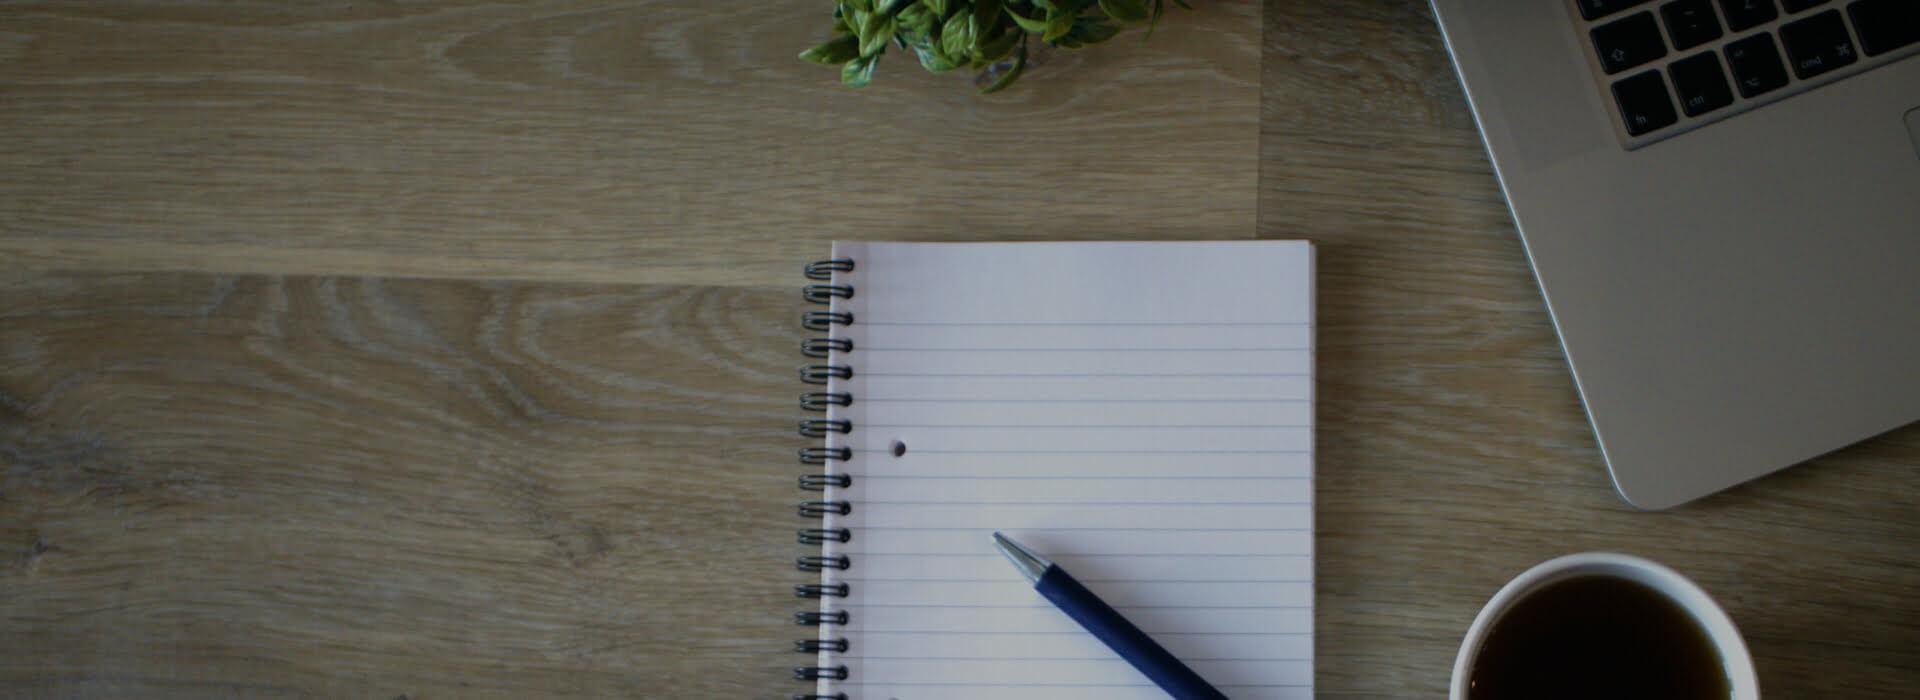 Home slider image - laptop, notepad, tea and plant on desk